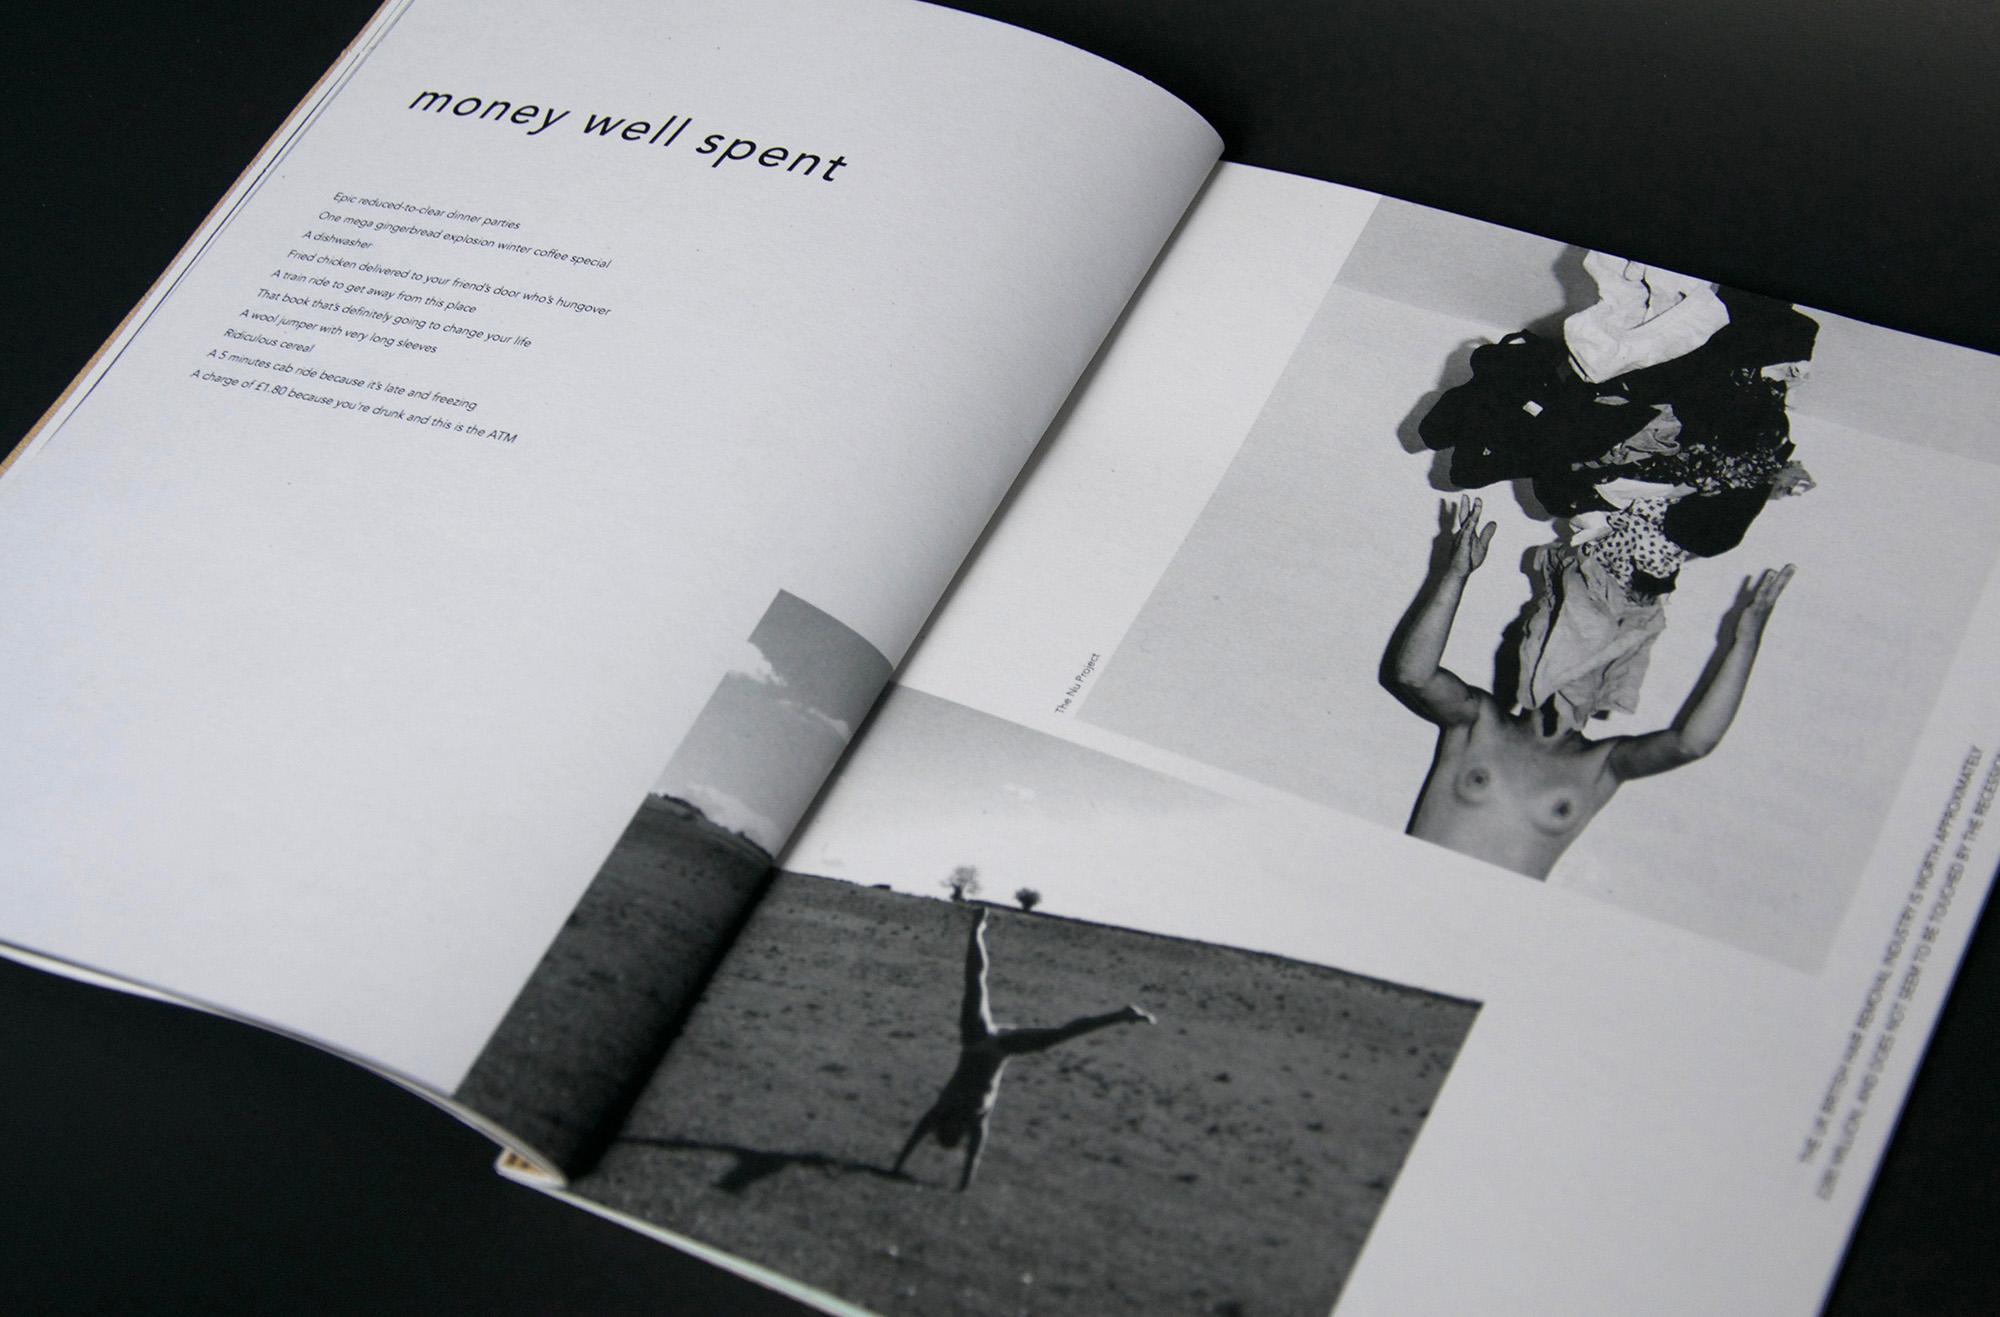 photos_page5a.jpg